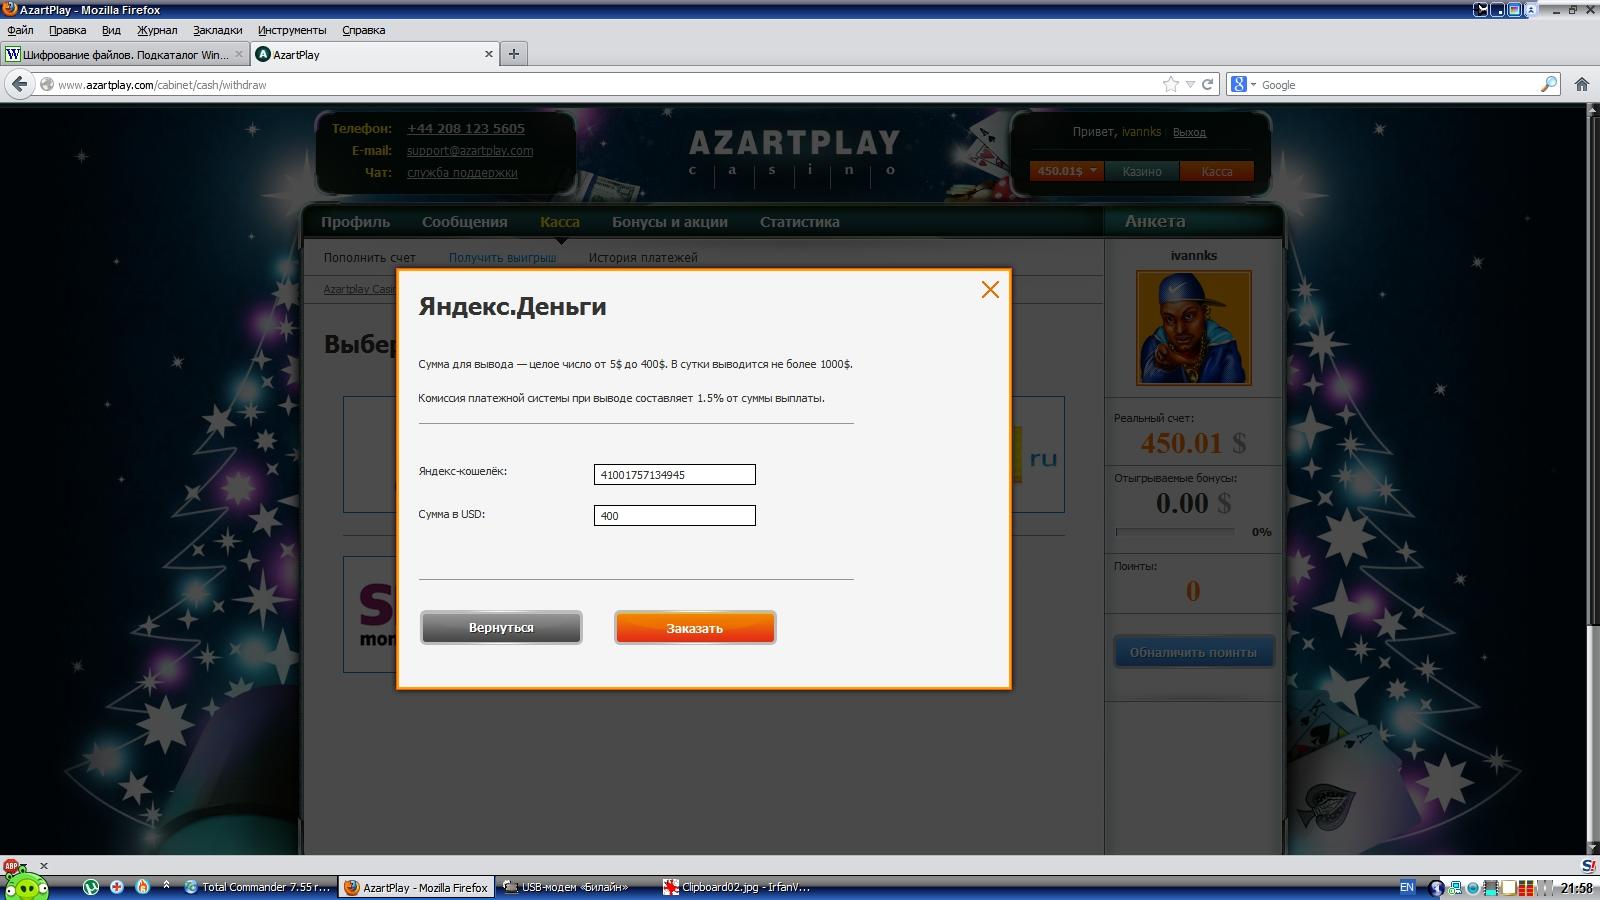 выплата #1444948 отклонена по реквизитам (с возвратом) www.azino-777.win